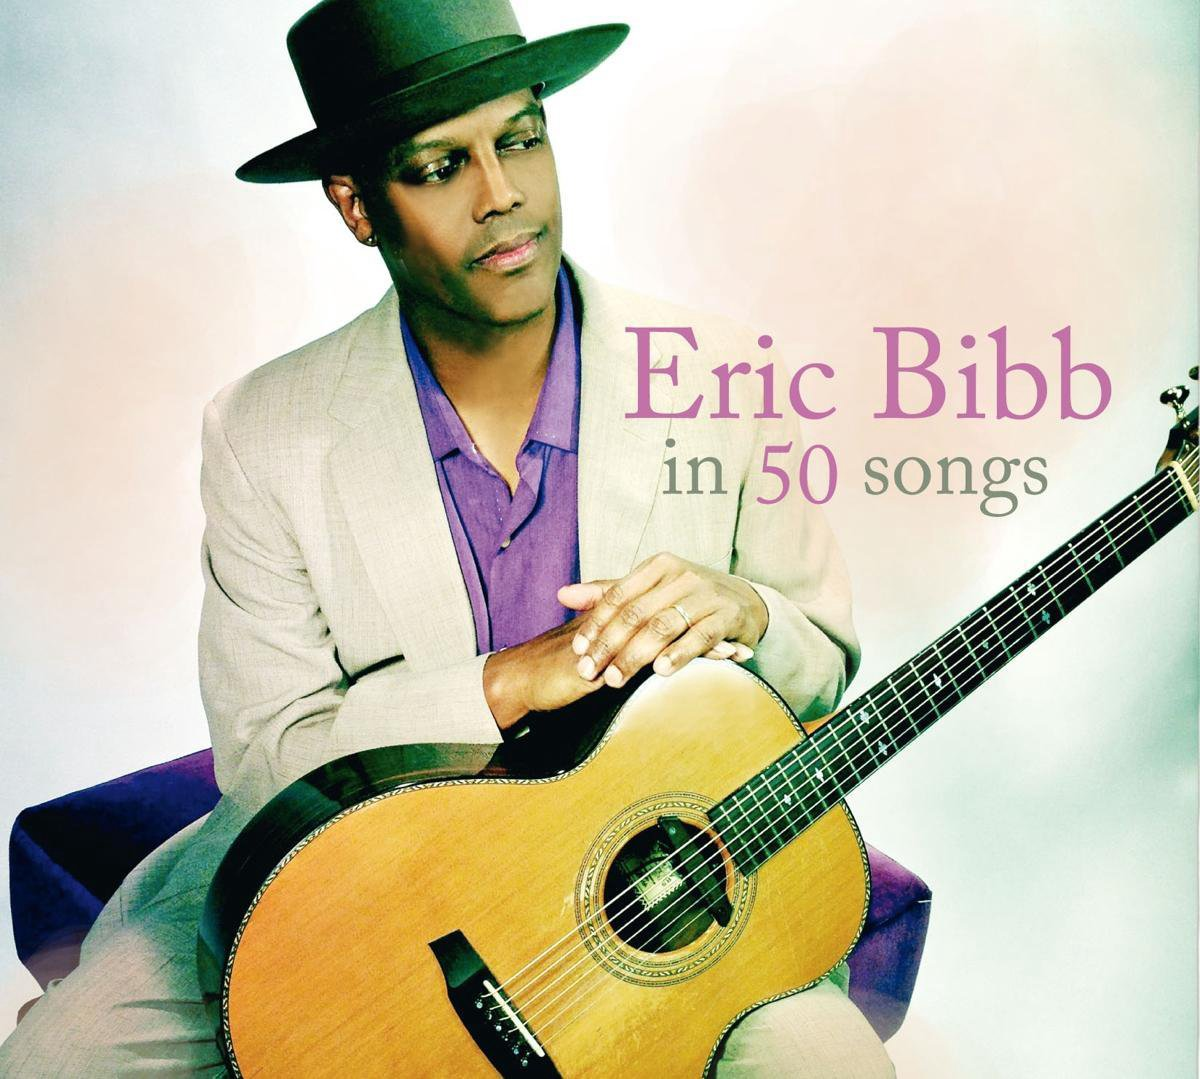 Bol Com In 50 Songs Eric Bibb Cd Album Muziek